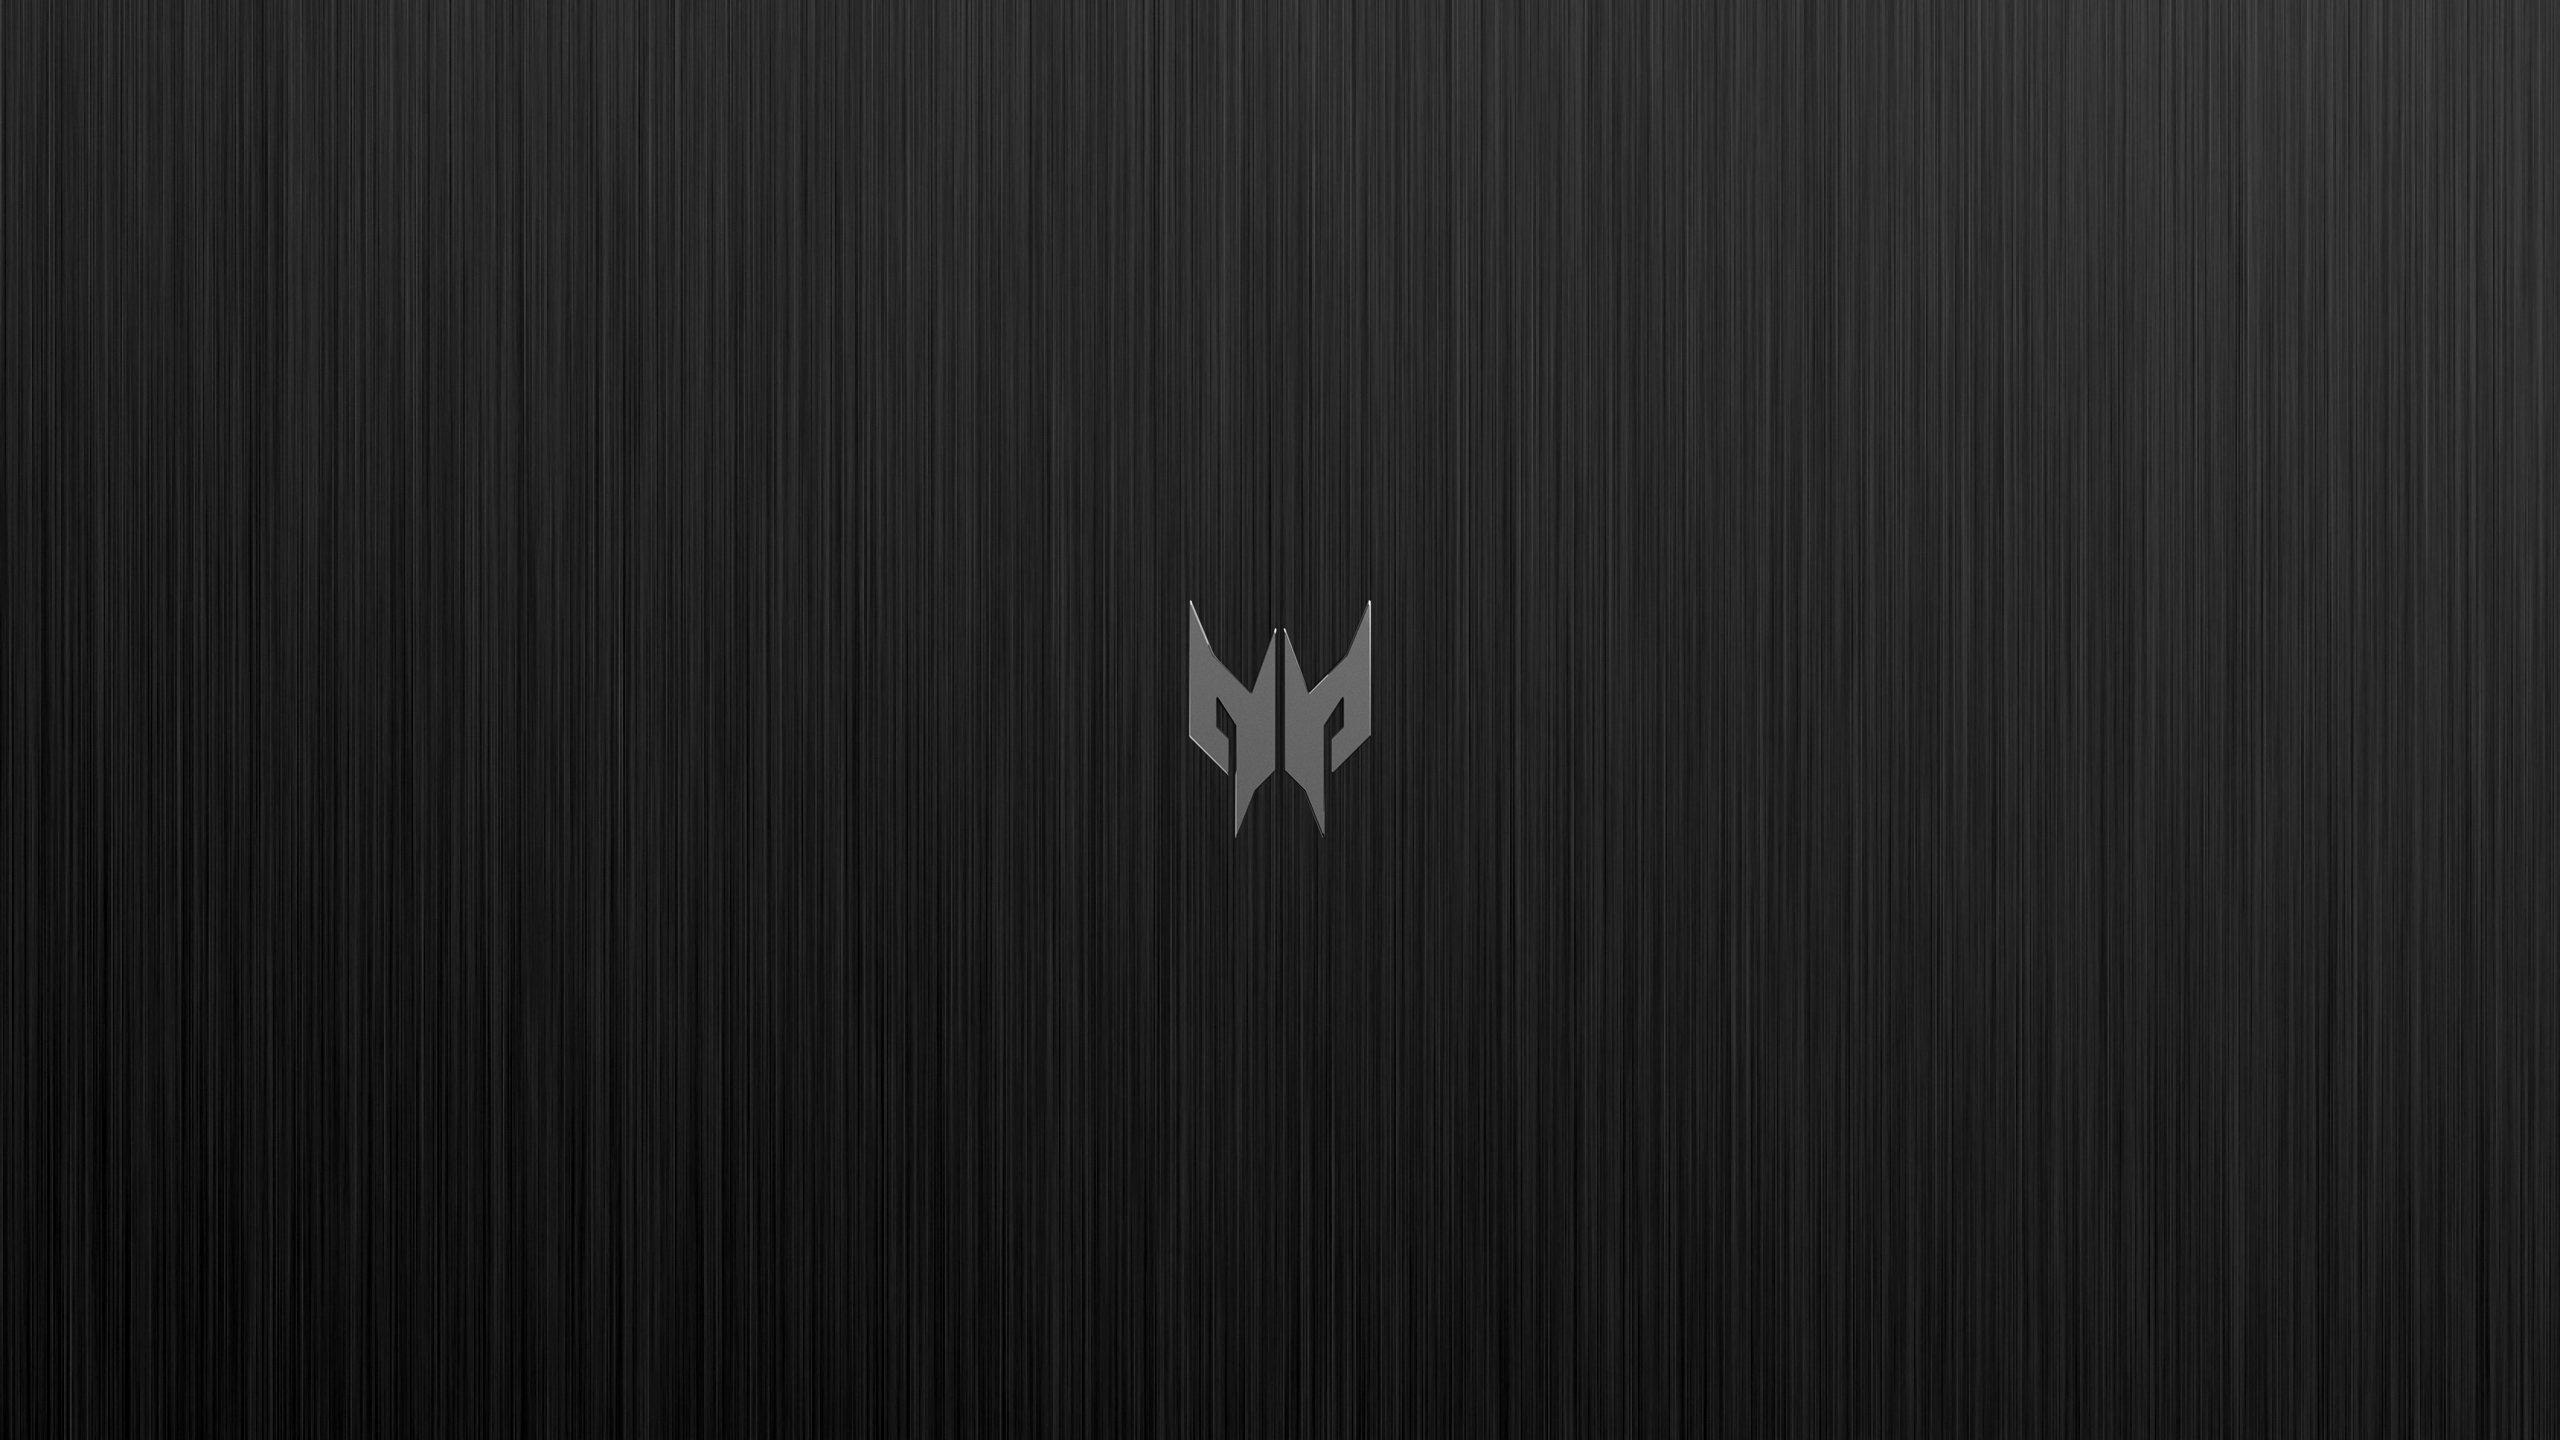 Predator 4k Wallpapers For Your Desktop Or Mobile Screen